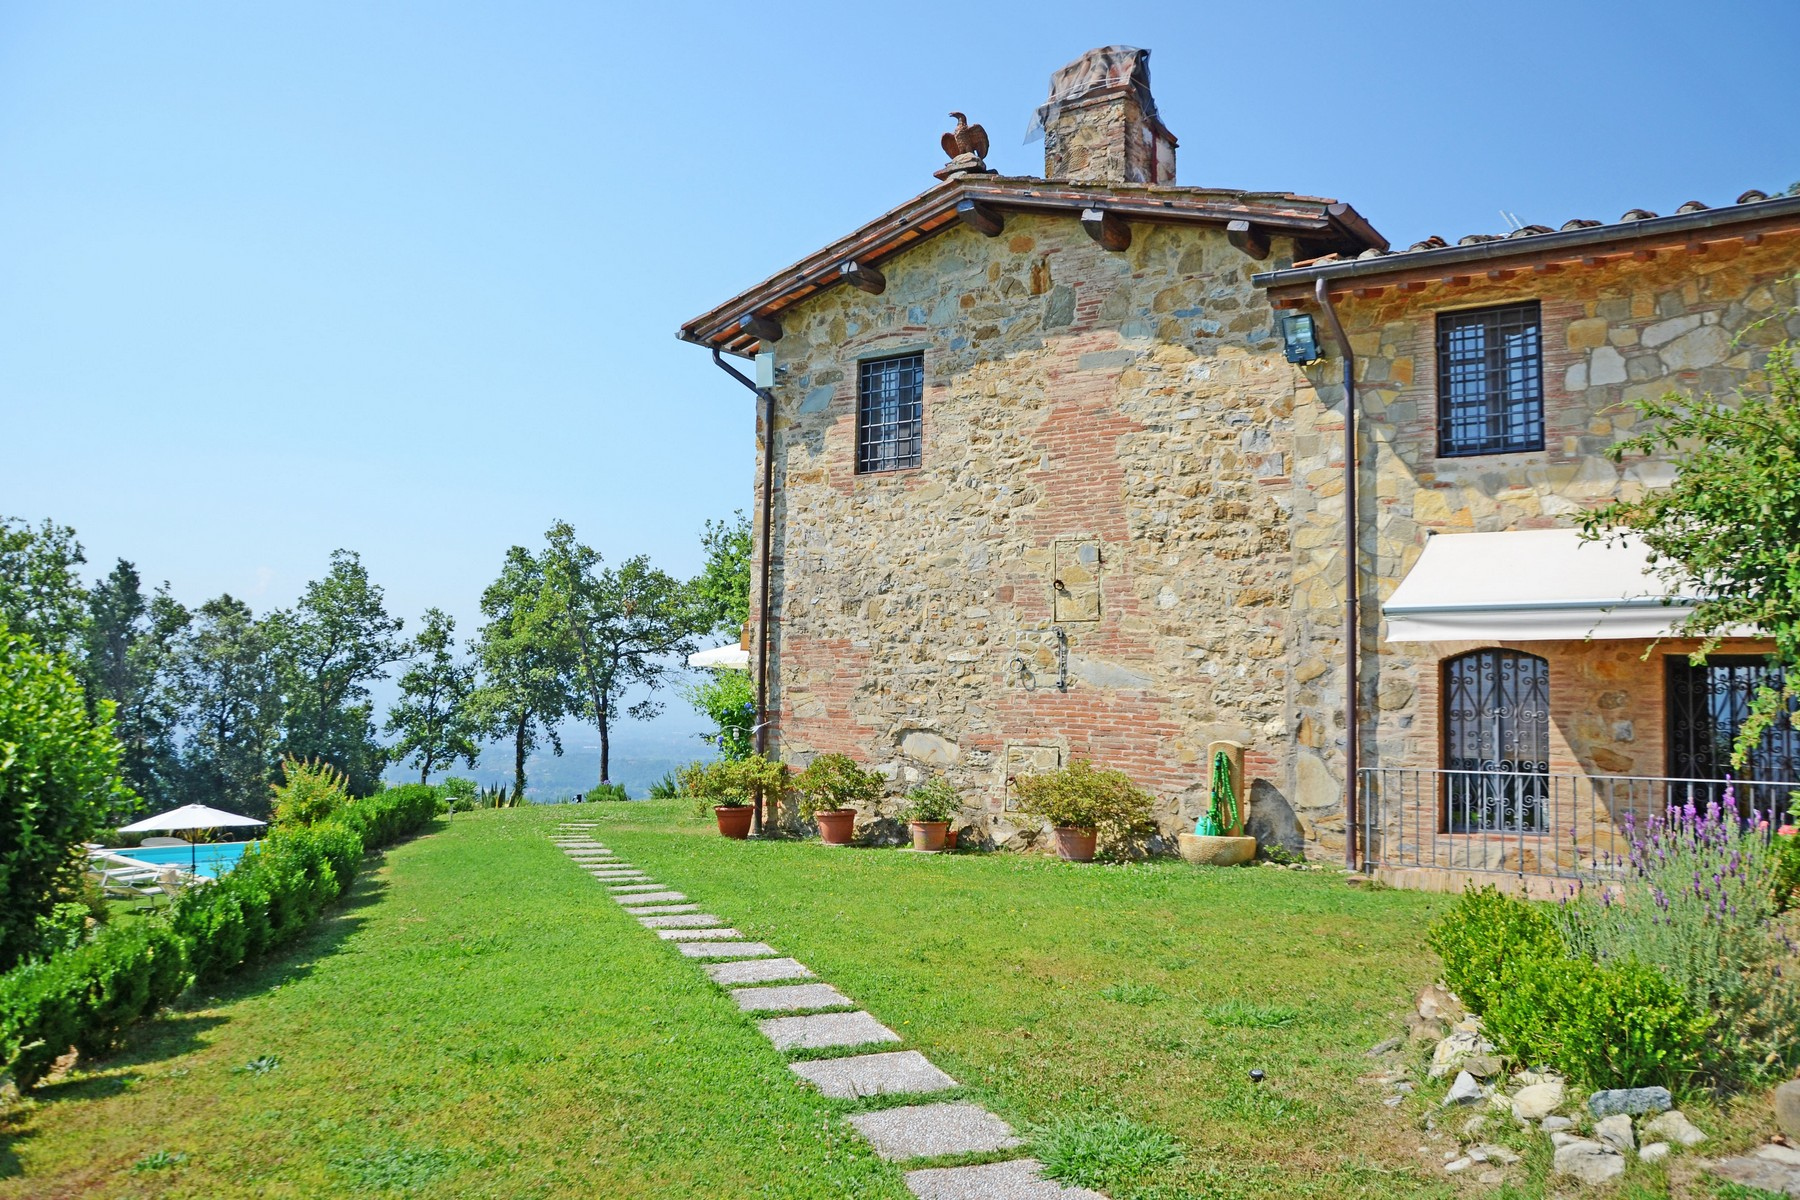 Rustico in Vendita a Lucca: 5 locali, 210 mq - Foto 3